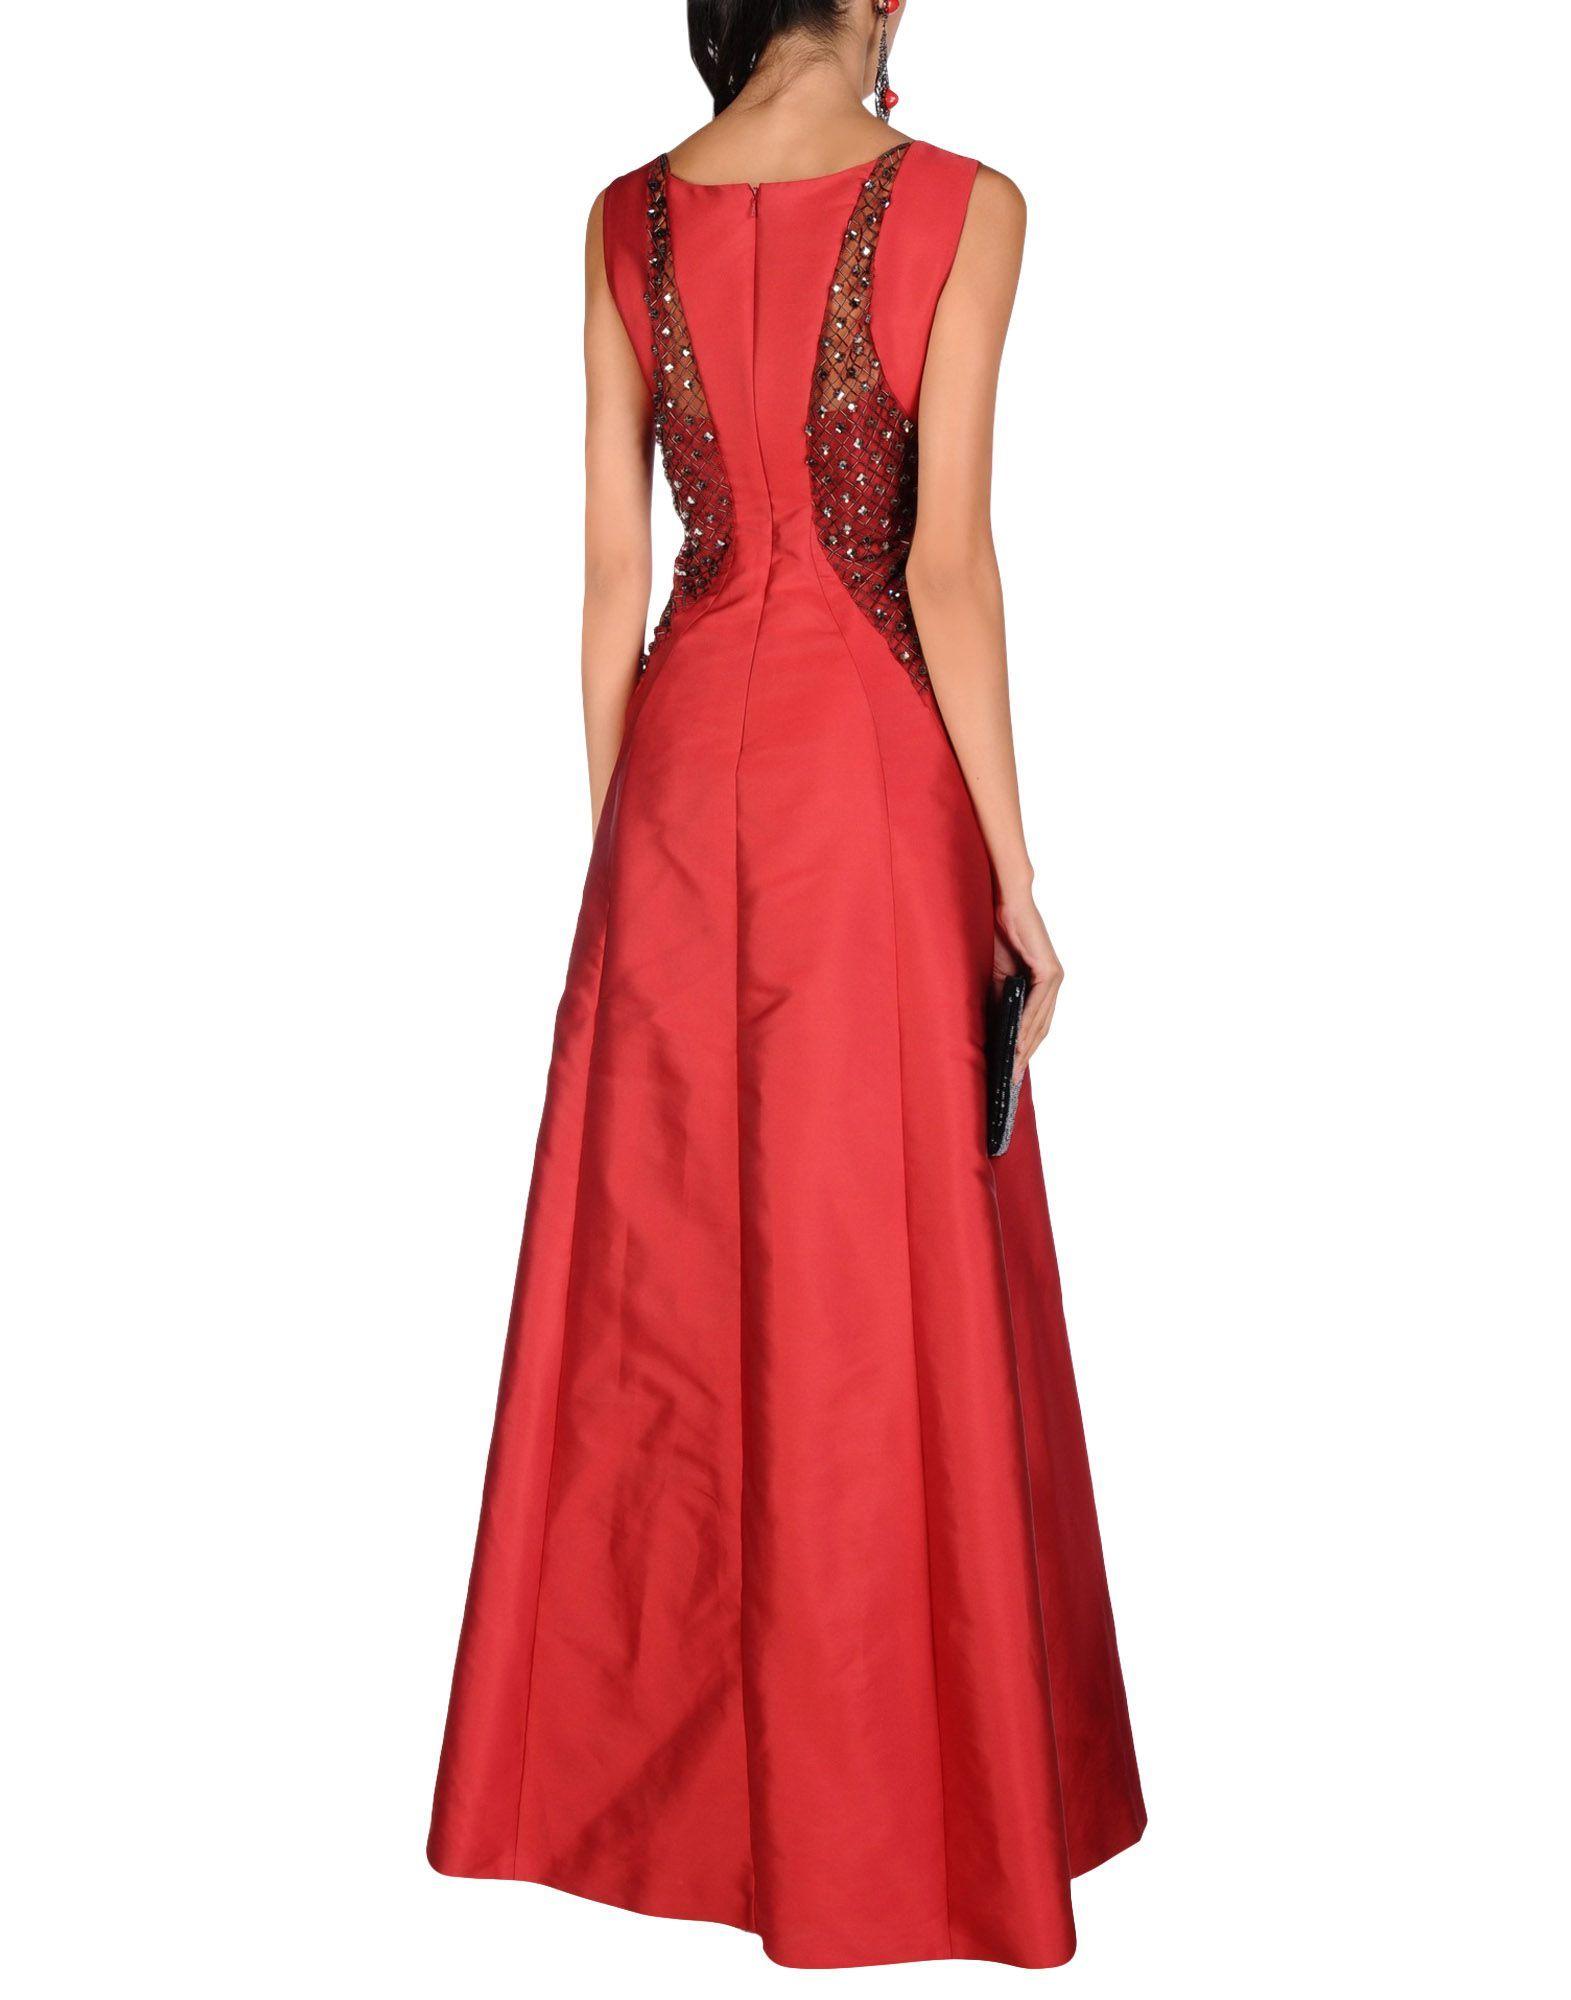 Alberta Ferretti Red Tulle And Taffeta Beaded Full Length Dress